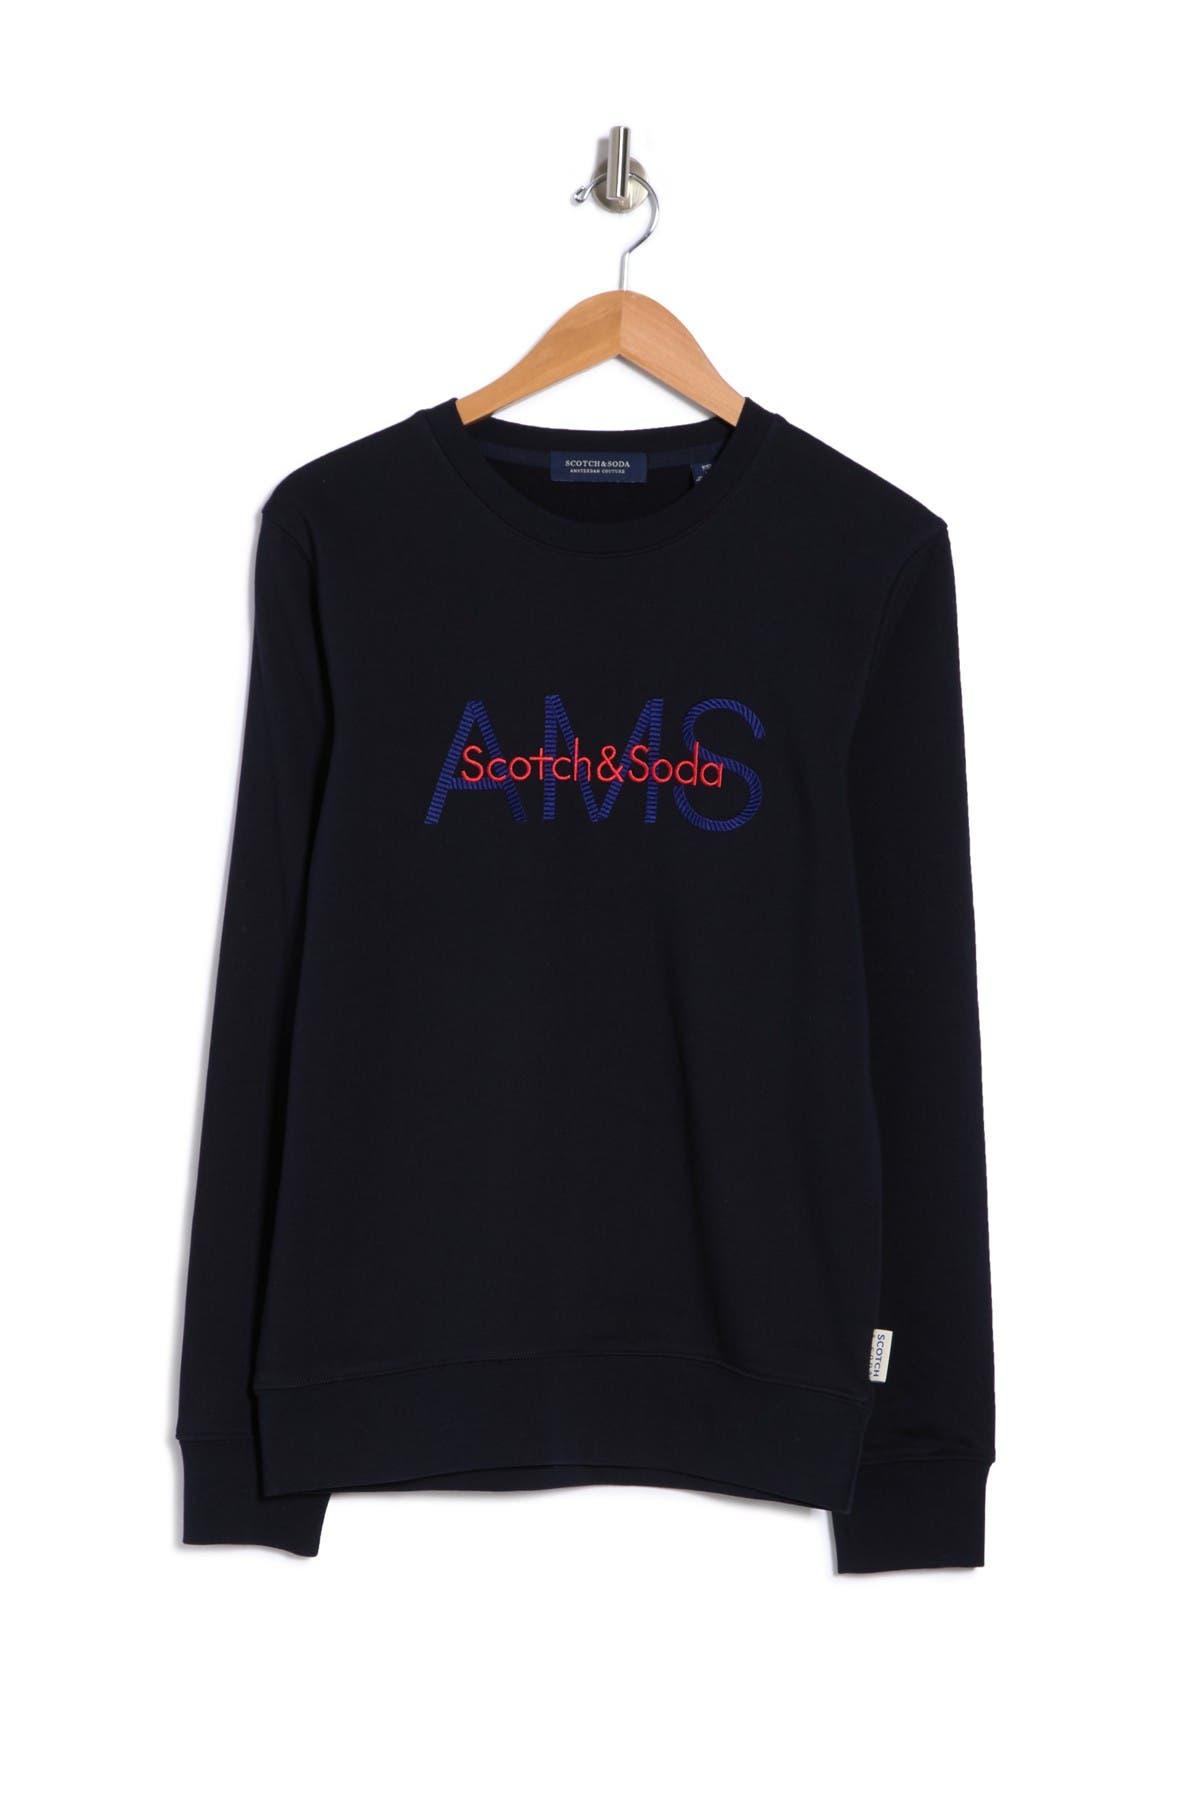 Image of Scotch & Soda Logo Print Crew Neck Sweater